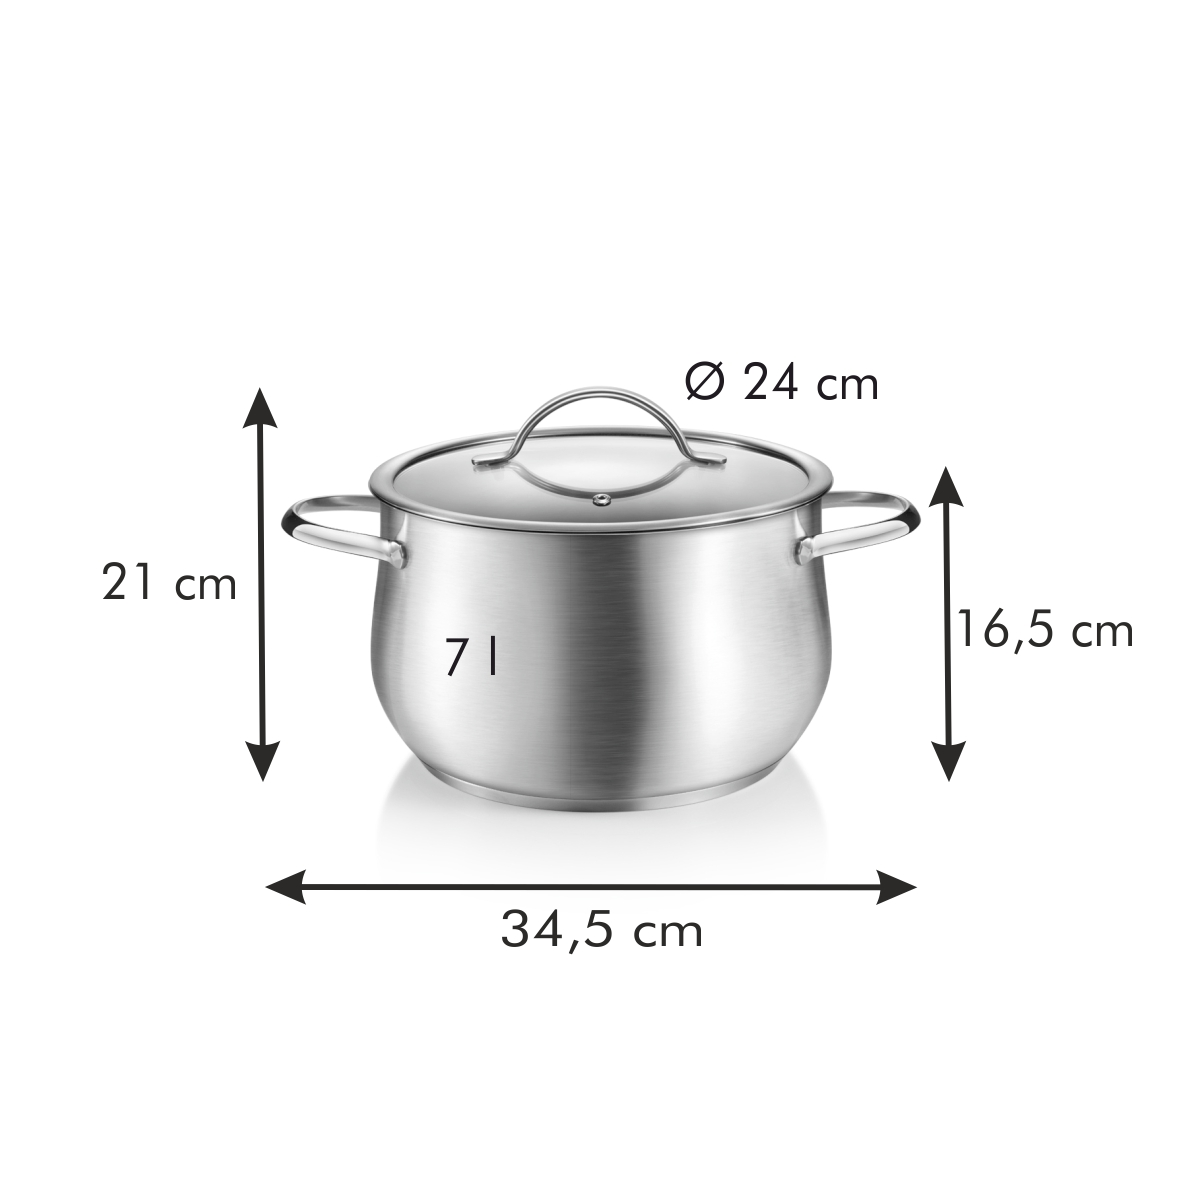 Hrnec s poklicí HARMONY ø 24 cm, 7,0 l